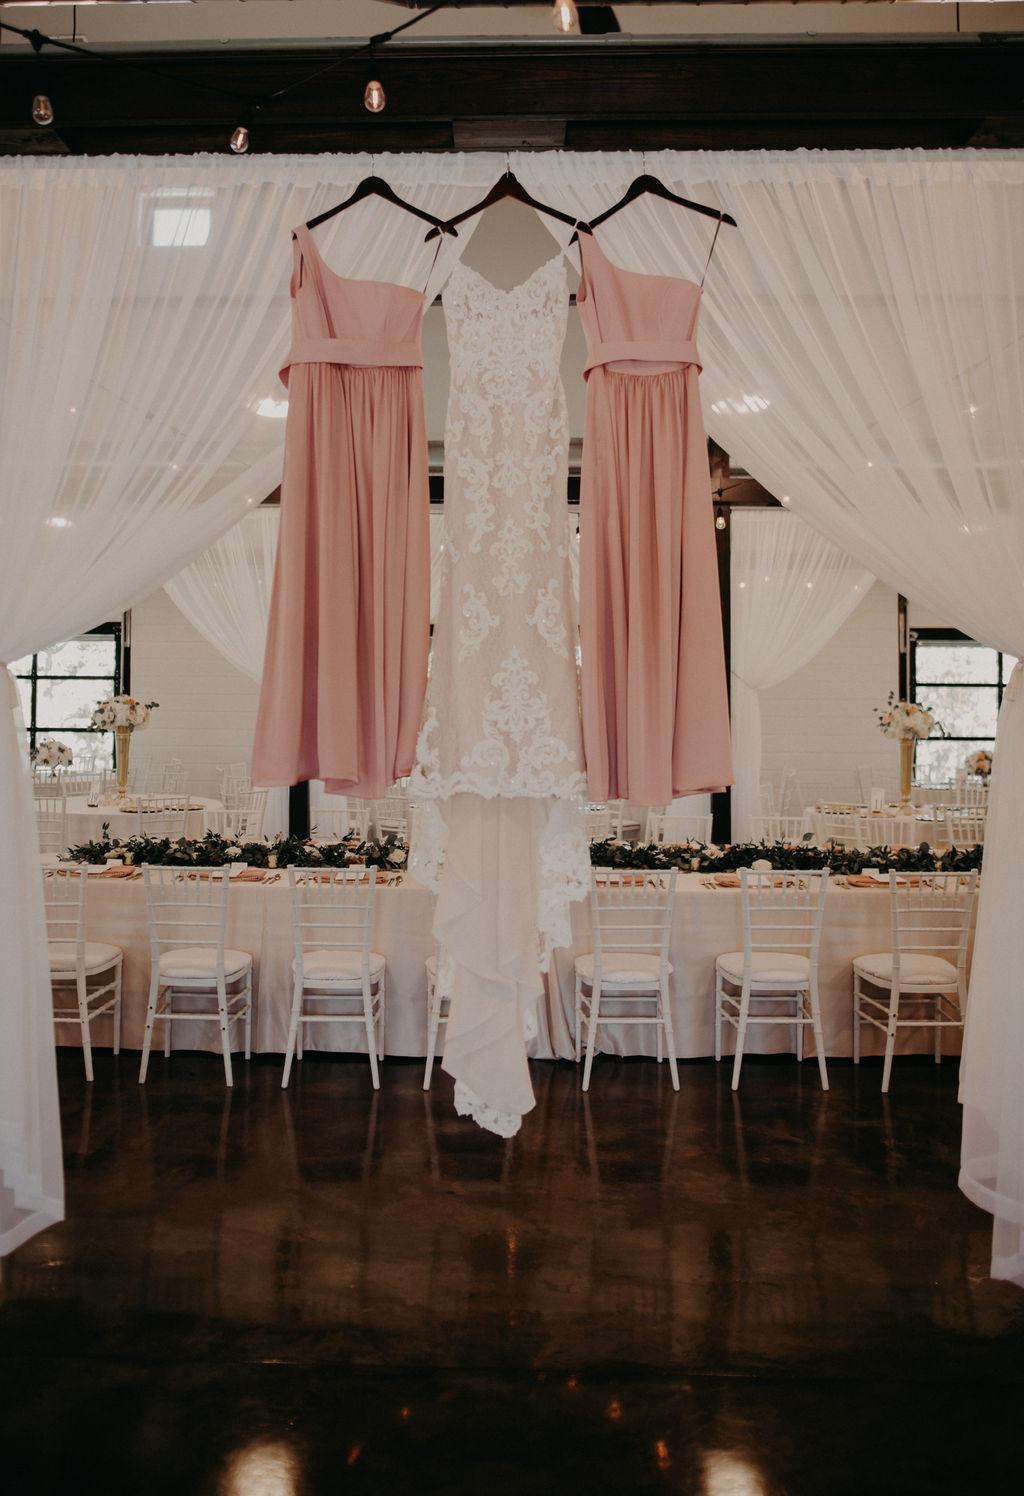 Best Oklahoma Outdoor Wedding Venue Tulsa Bixby White Barn 1.jpg